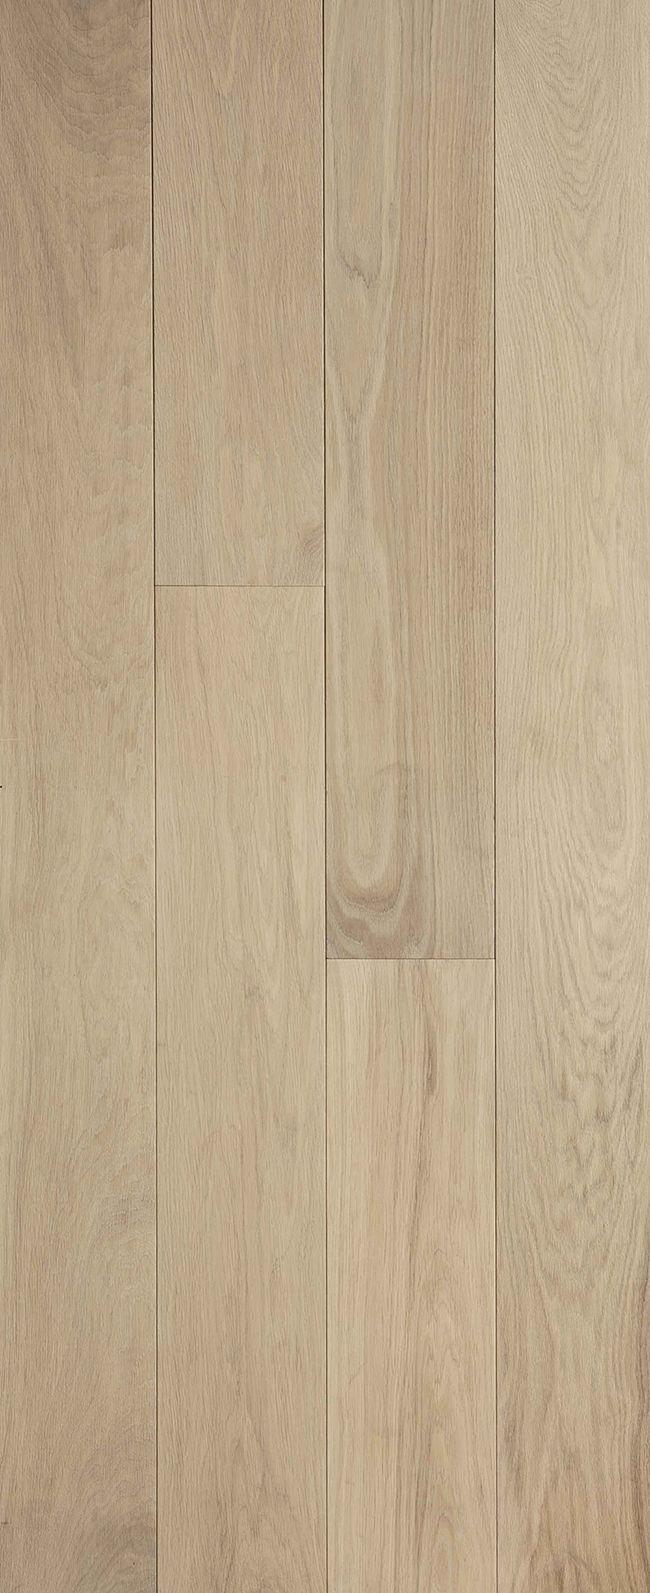 LATTE Engineered Prime Oak Текстура стены, Расширение дома